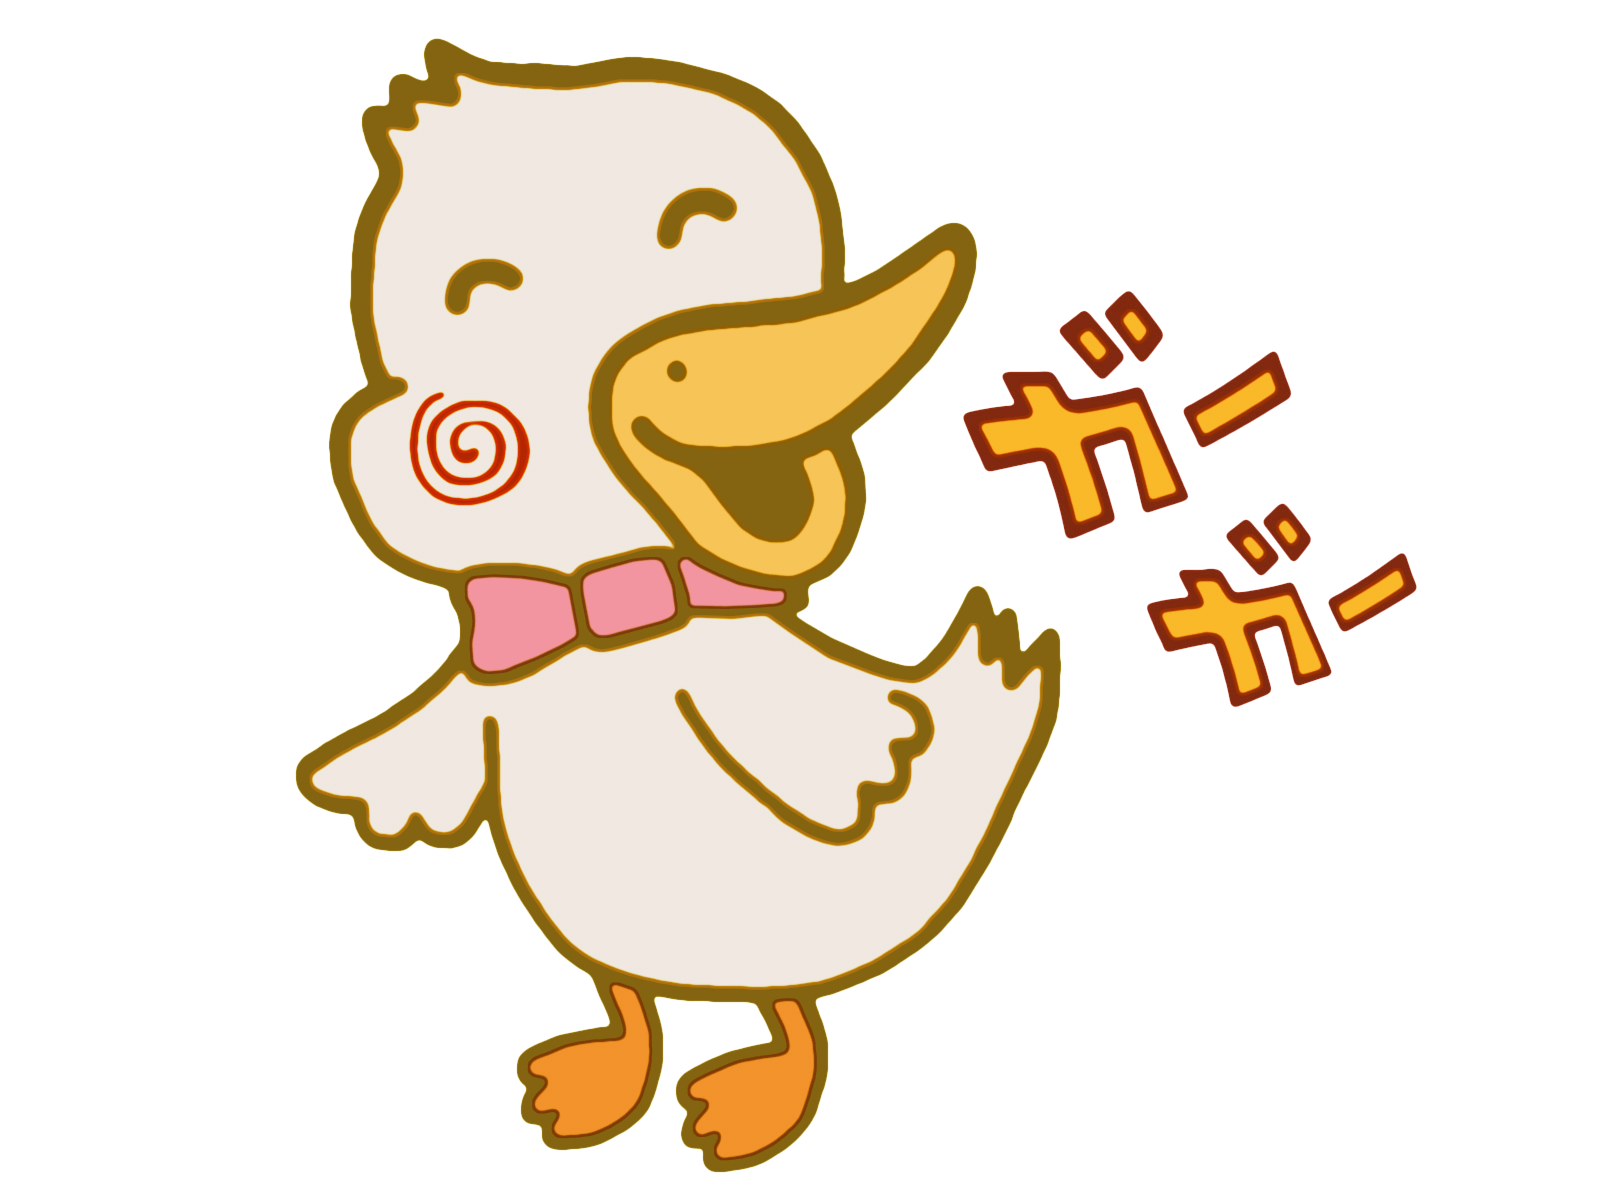 【Japanese Onomatopoeia】GAA-GAA / GUWA-GUWA / ガーガー・グワッグワッ